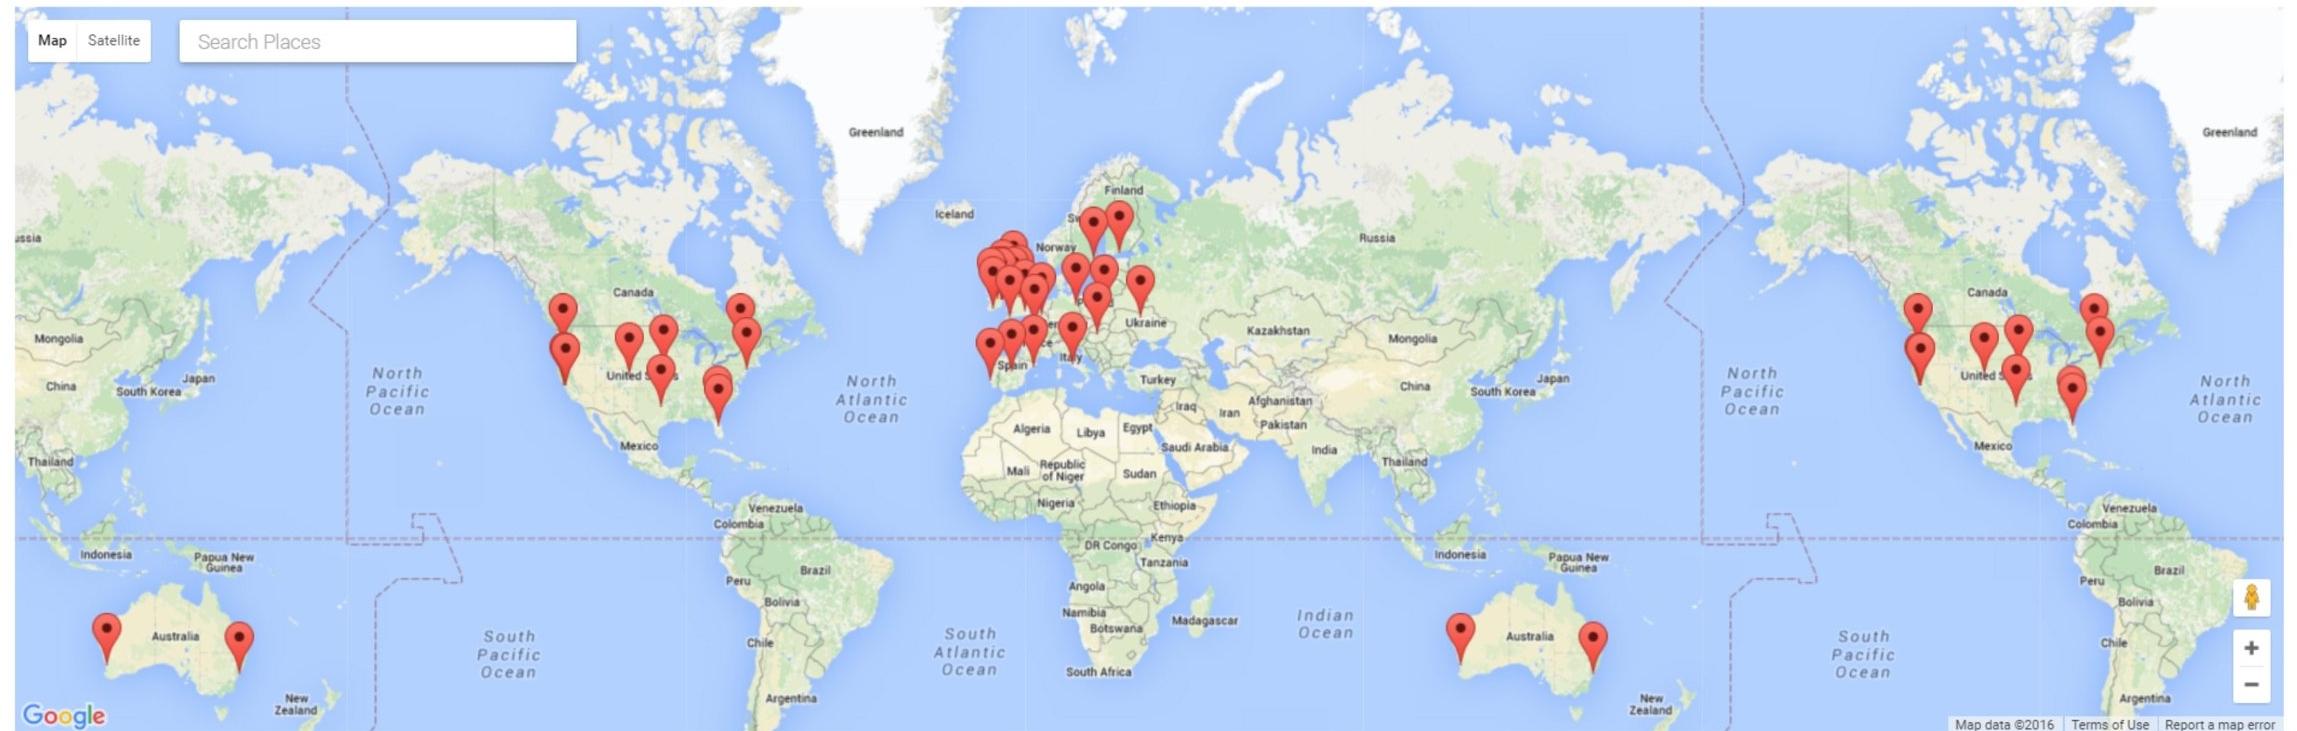 Map View.jpg